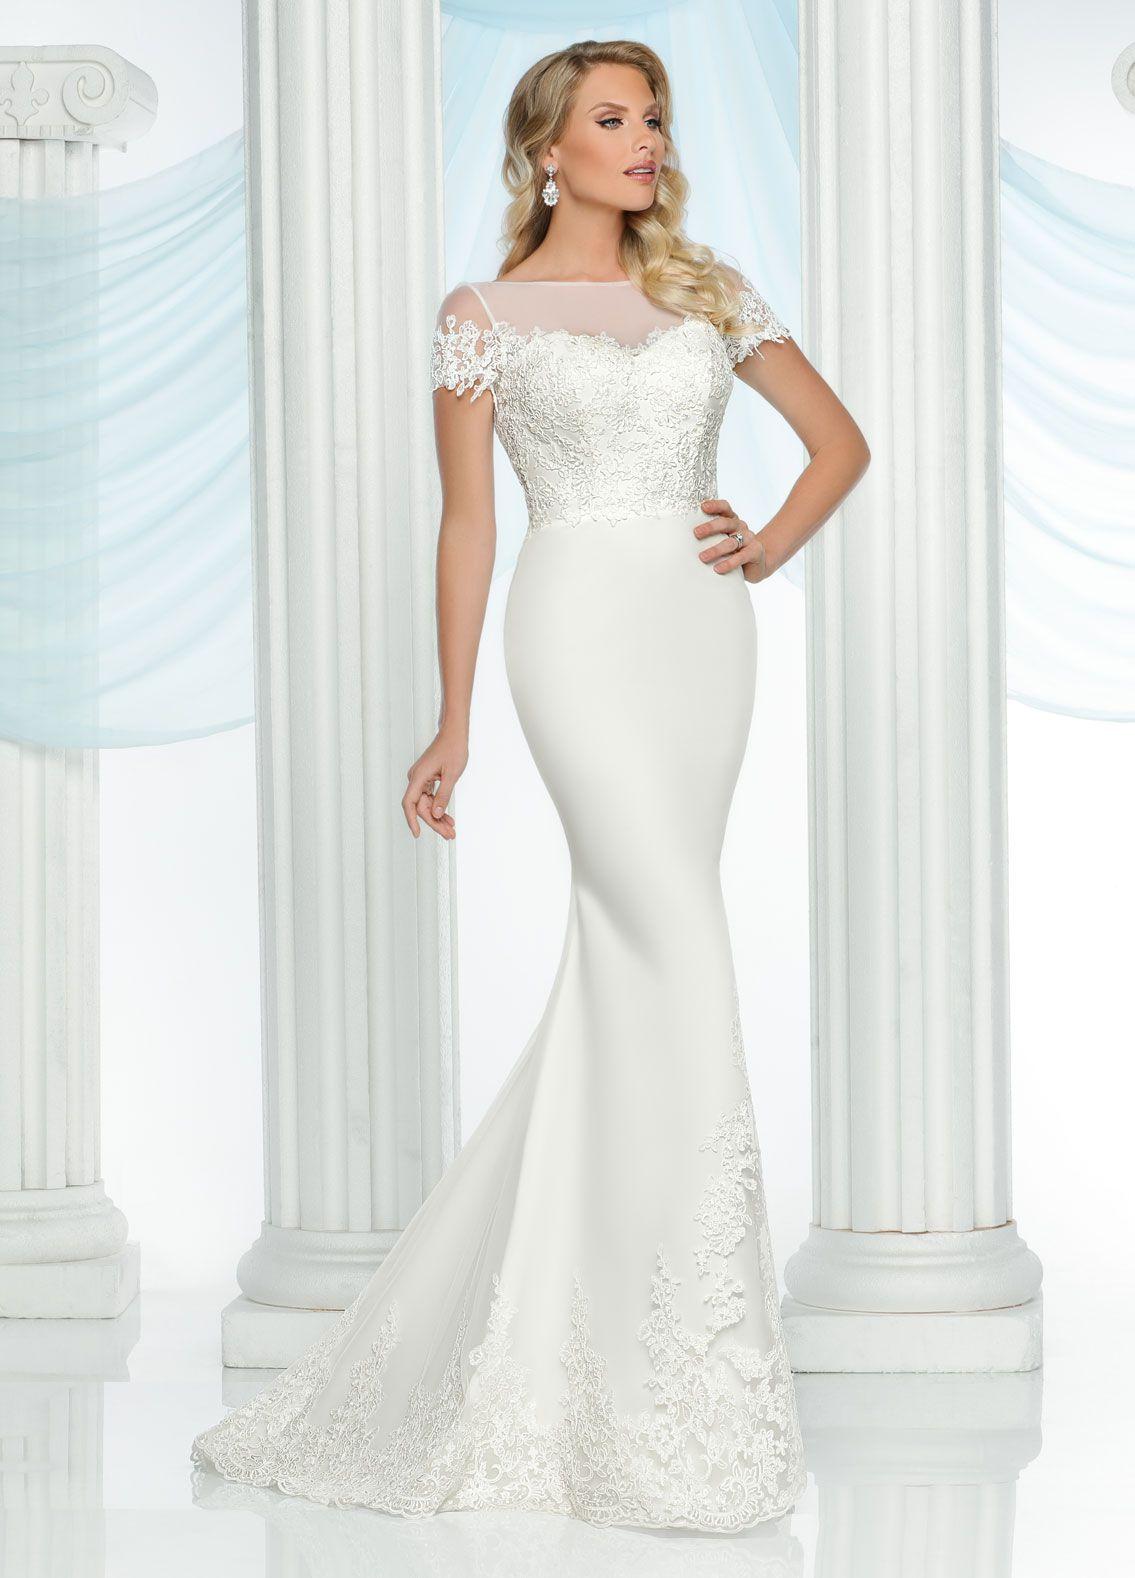 34+ Sheer cap sleeve wedding dress ideas in 2021